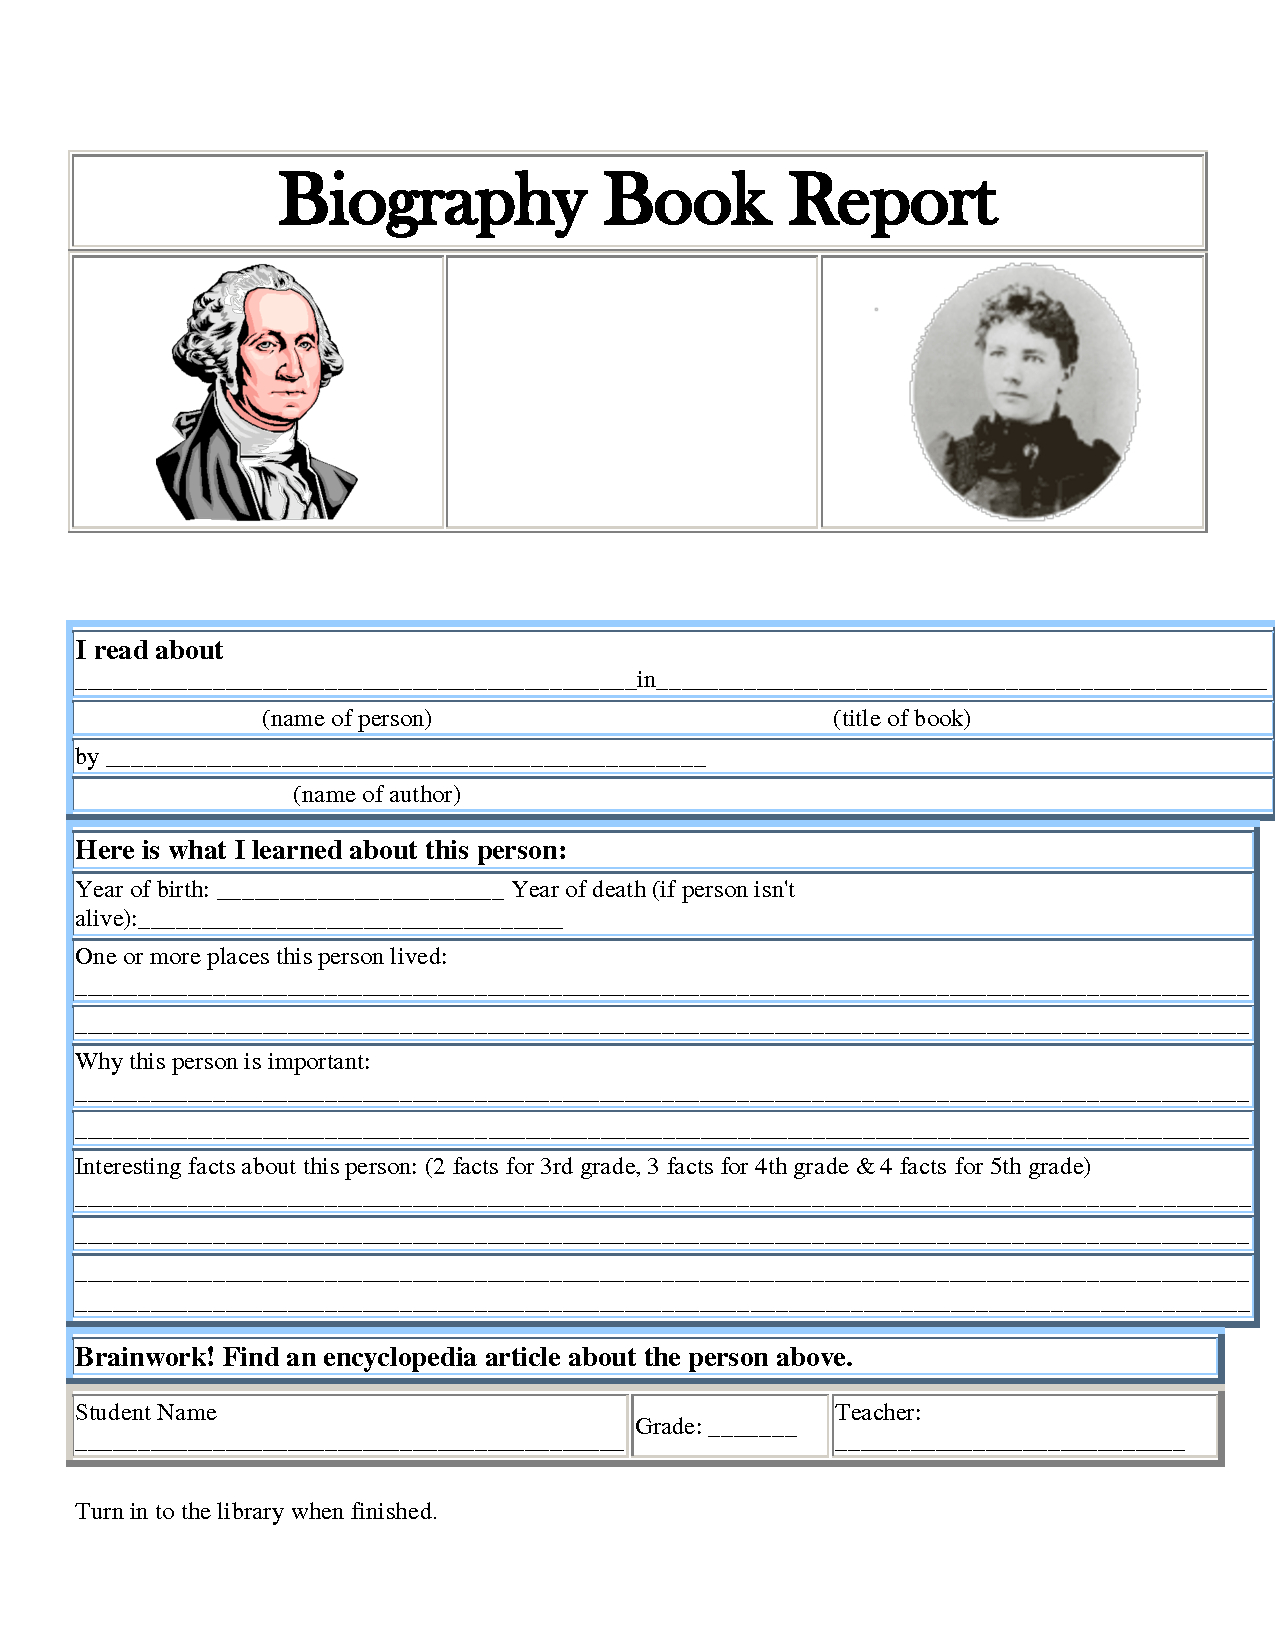 5Th Grade Dol Worksheet | Printable Worksheets And Regarding Biography Book Report Template